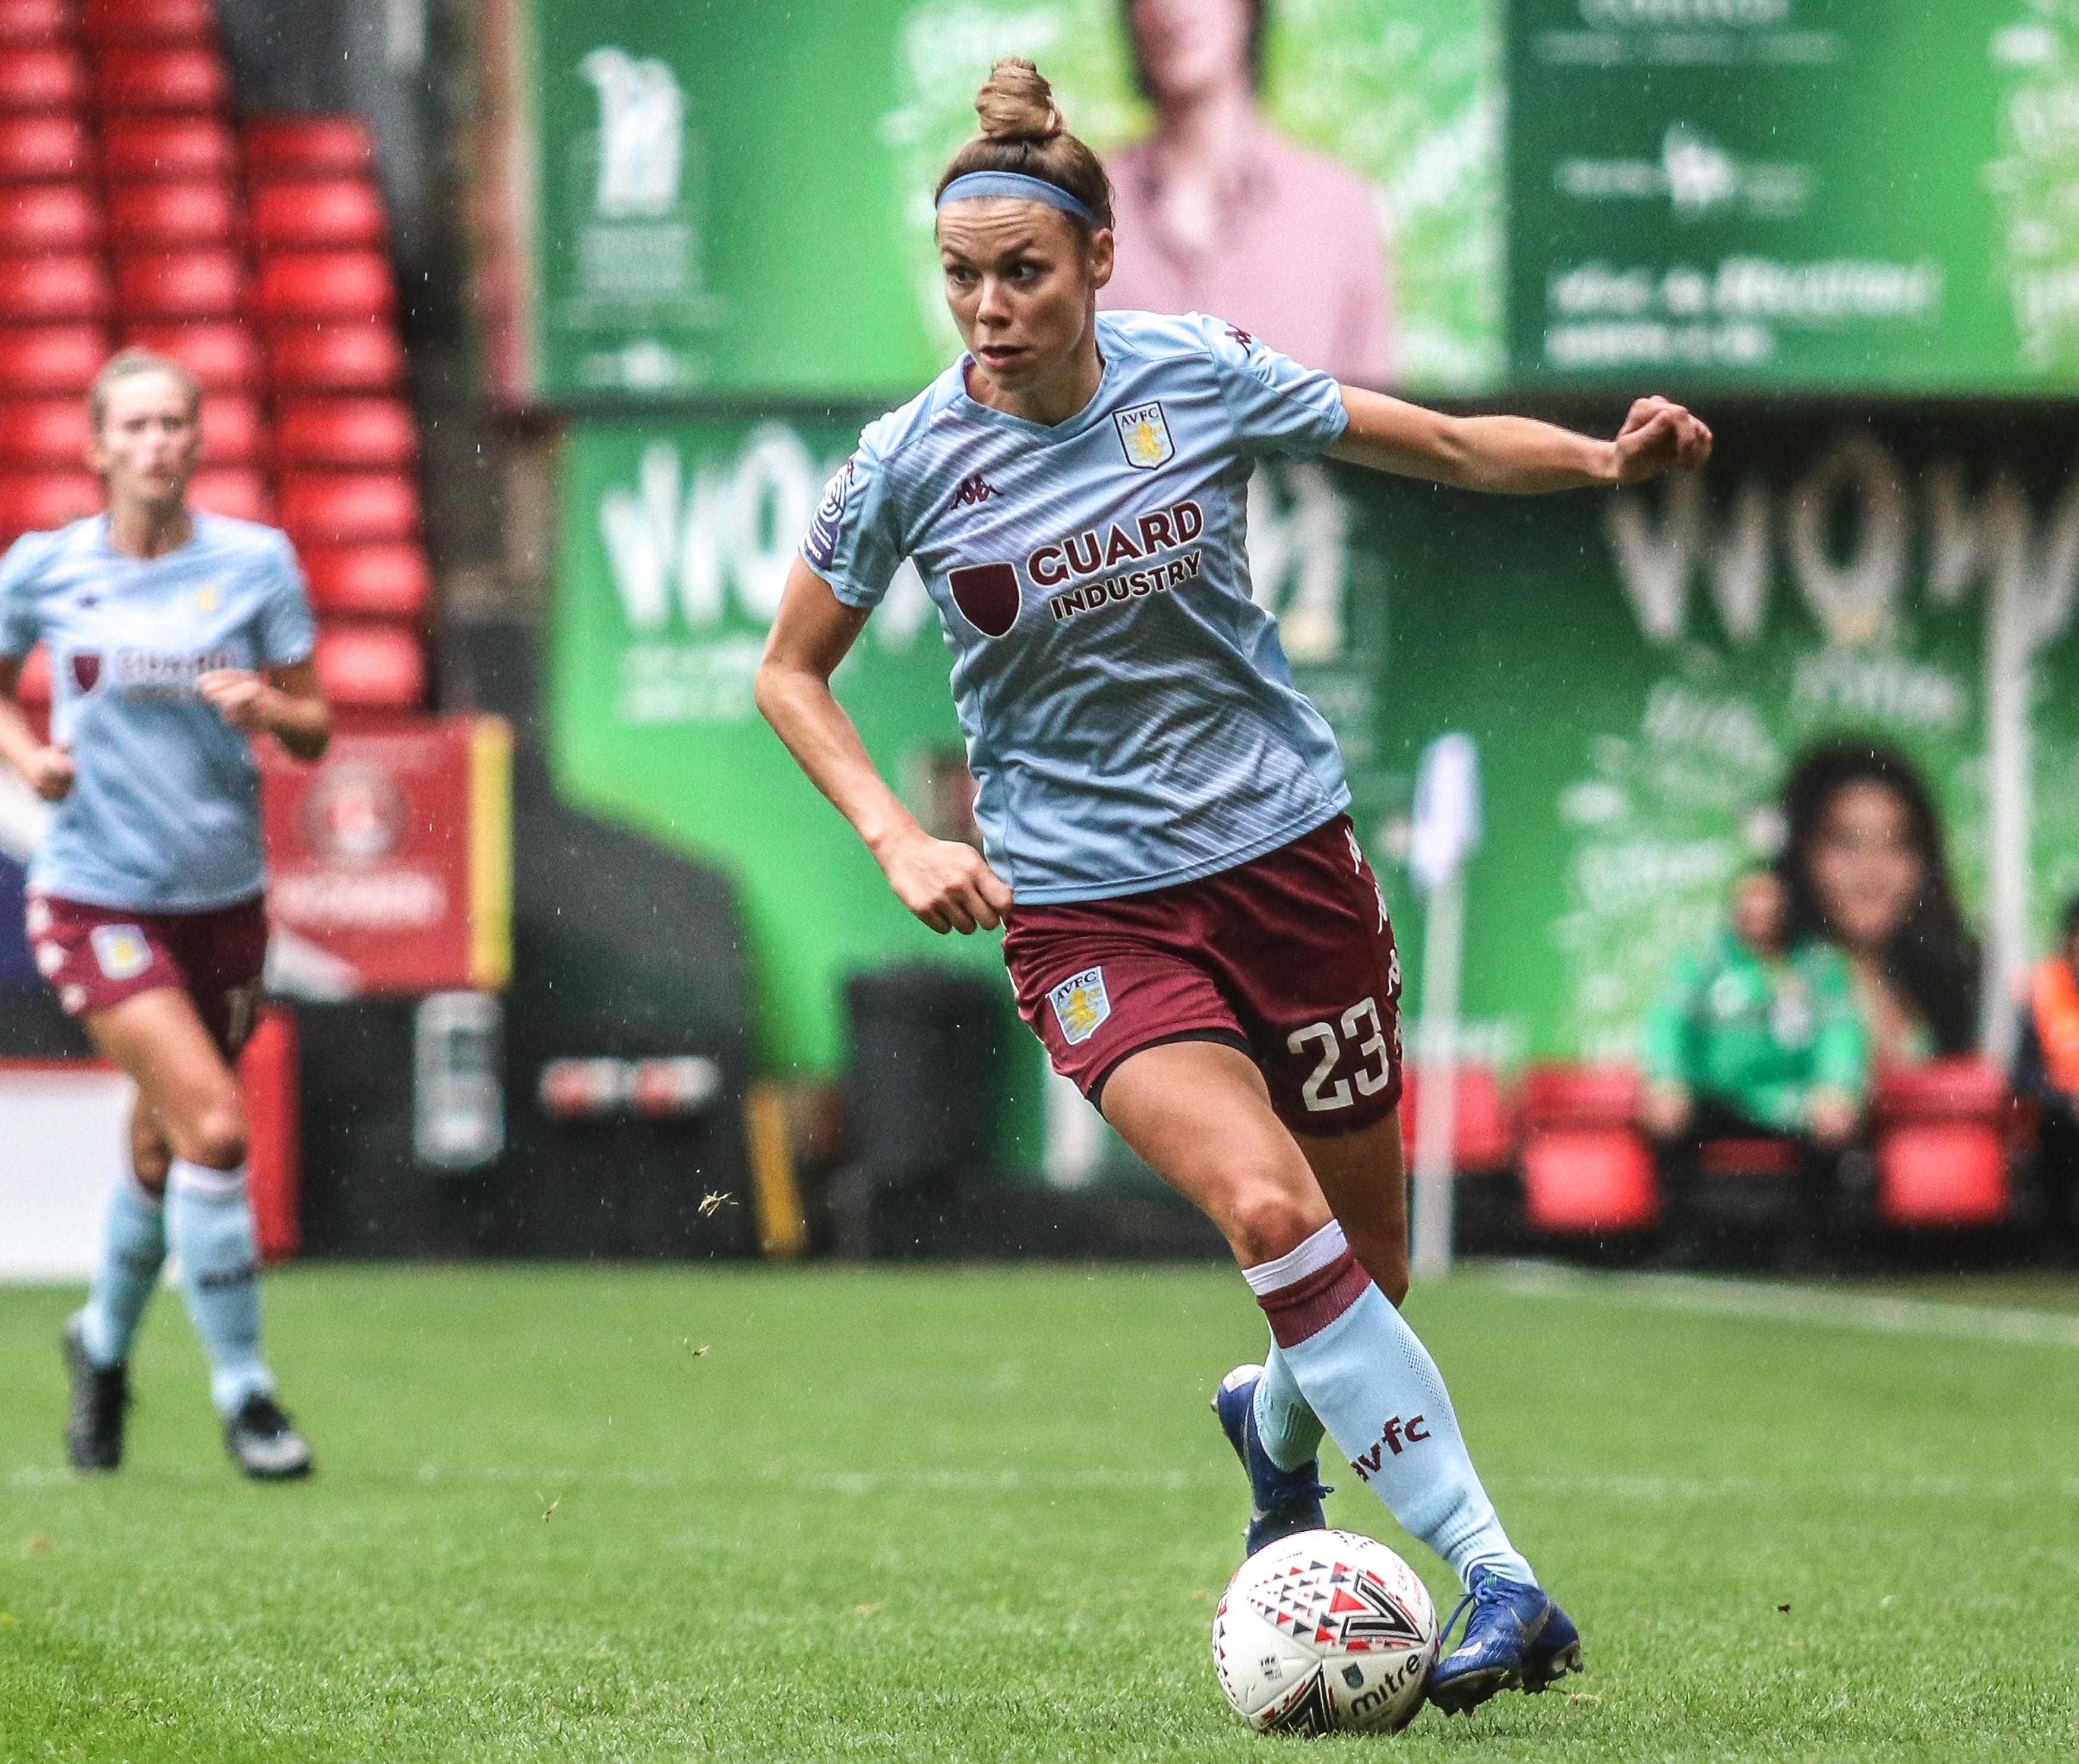 Charlton Athletic v Aston Villa - FA Women's Championship